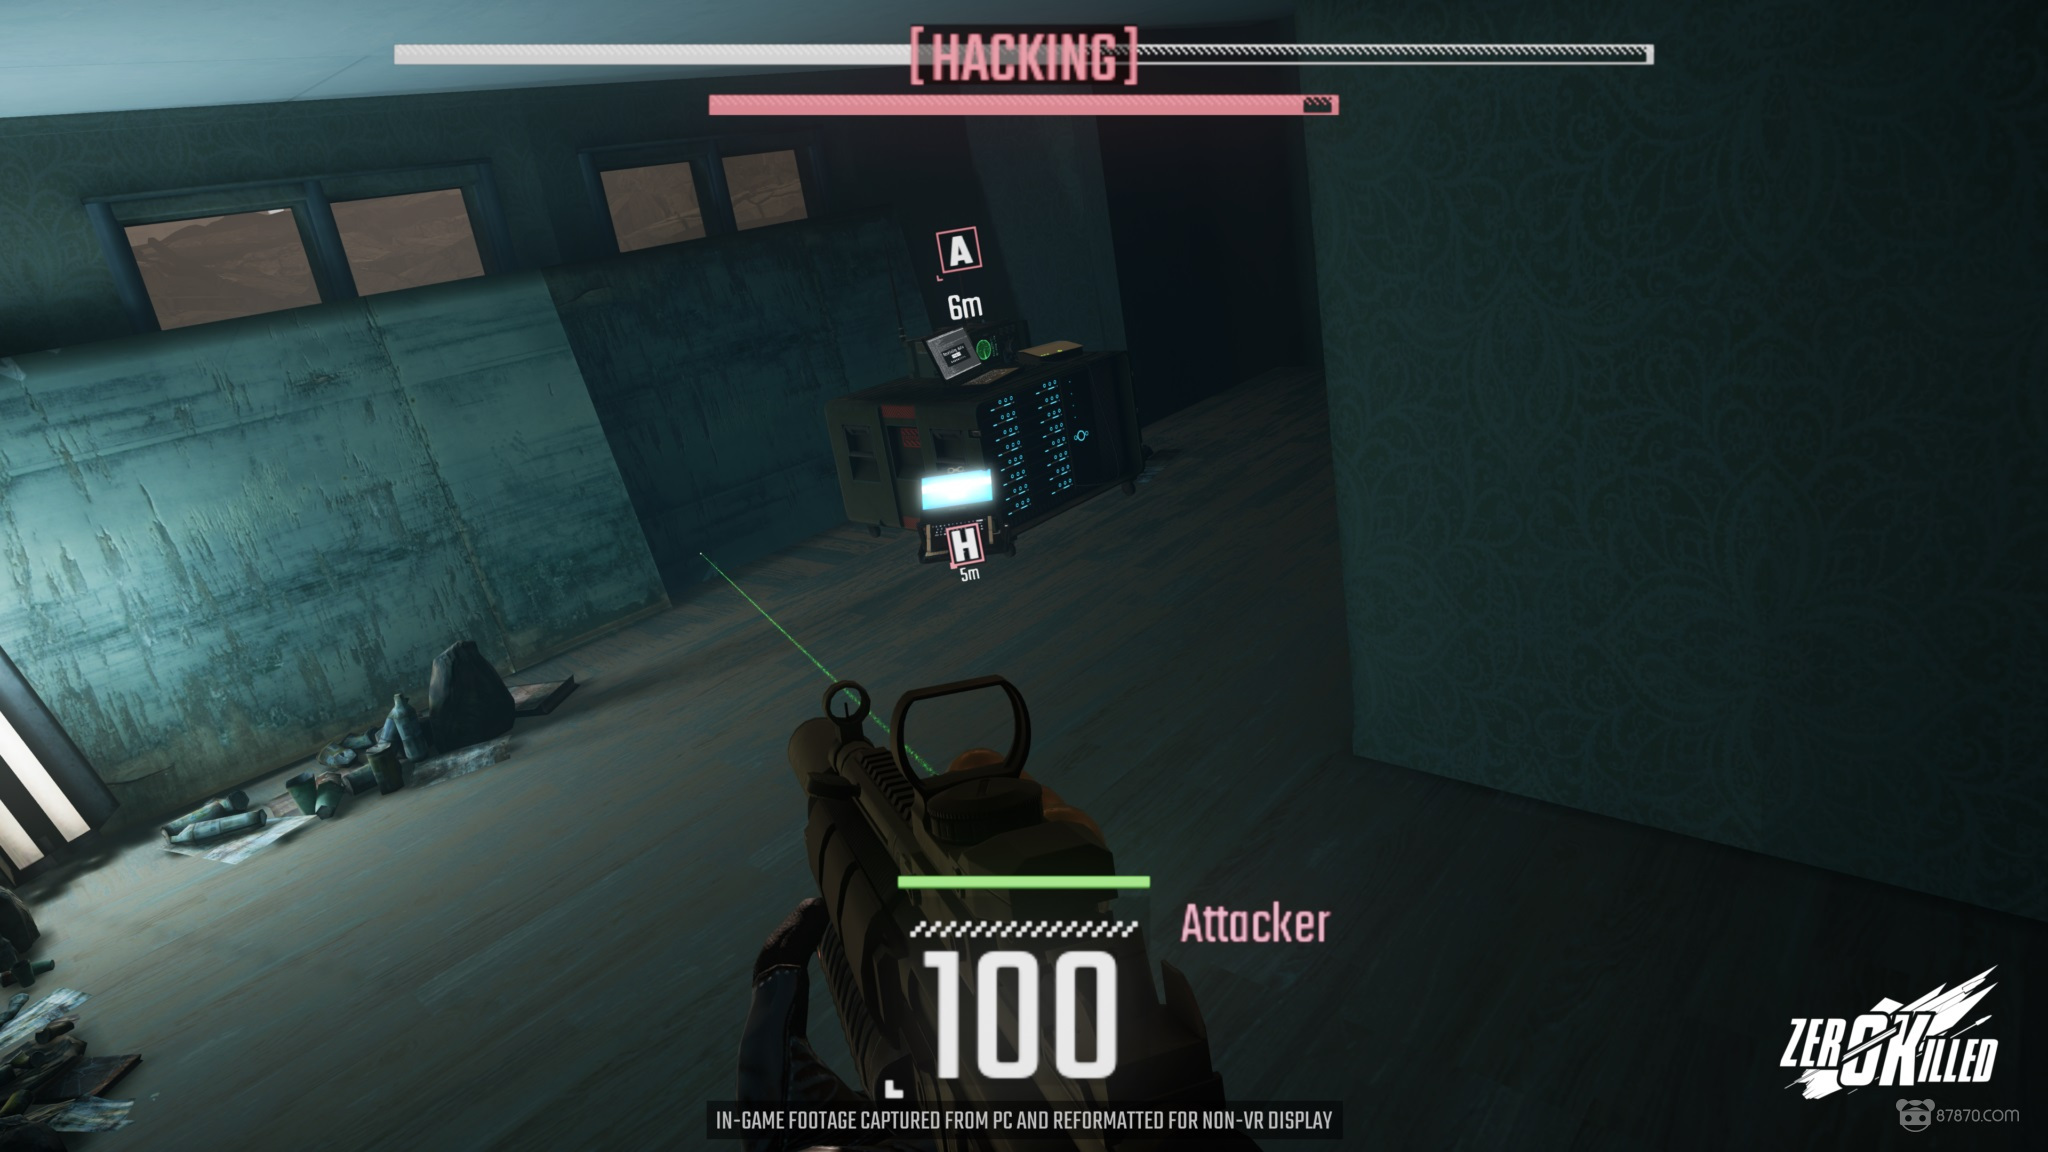 Vr射击游戏zero Killed上线steam Early Acc玩家